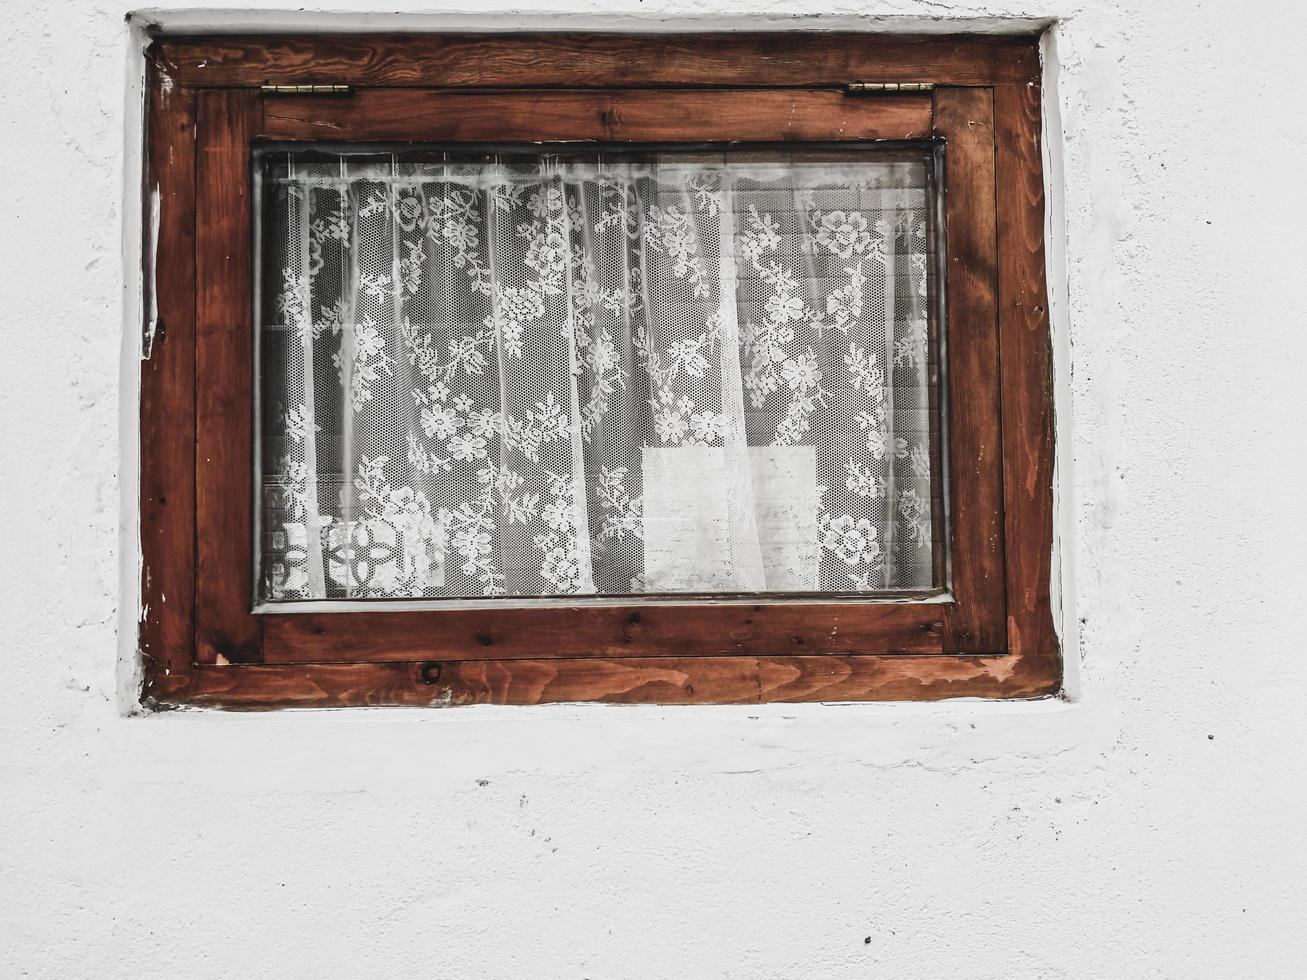 Ventana rústica con cortinas de encaje blanco. viejo, vendimia, ventana, grunge, pared de cemento foto